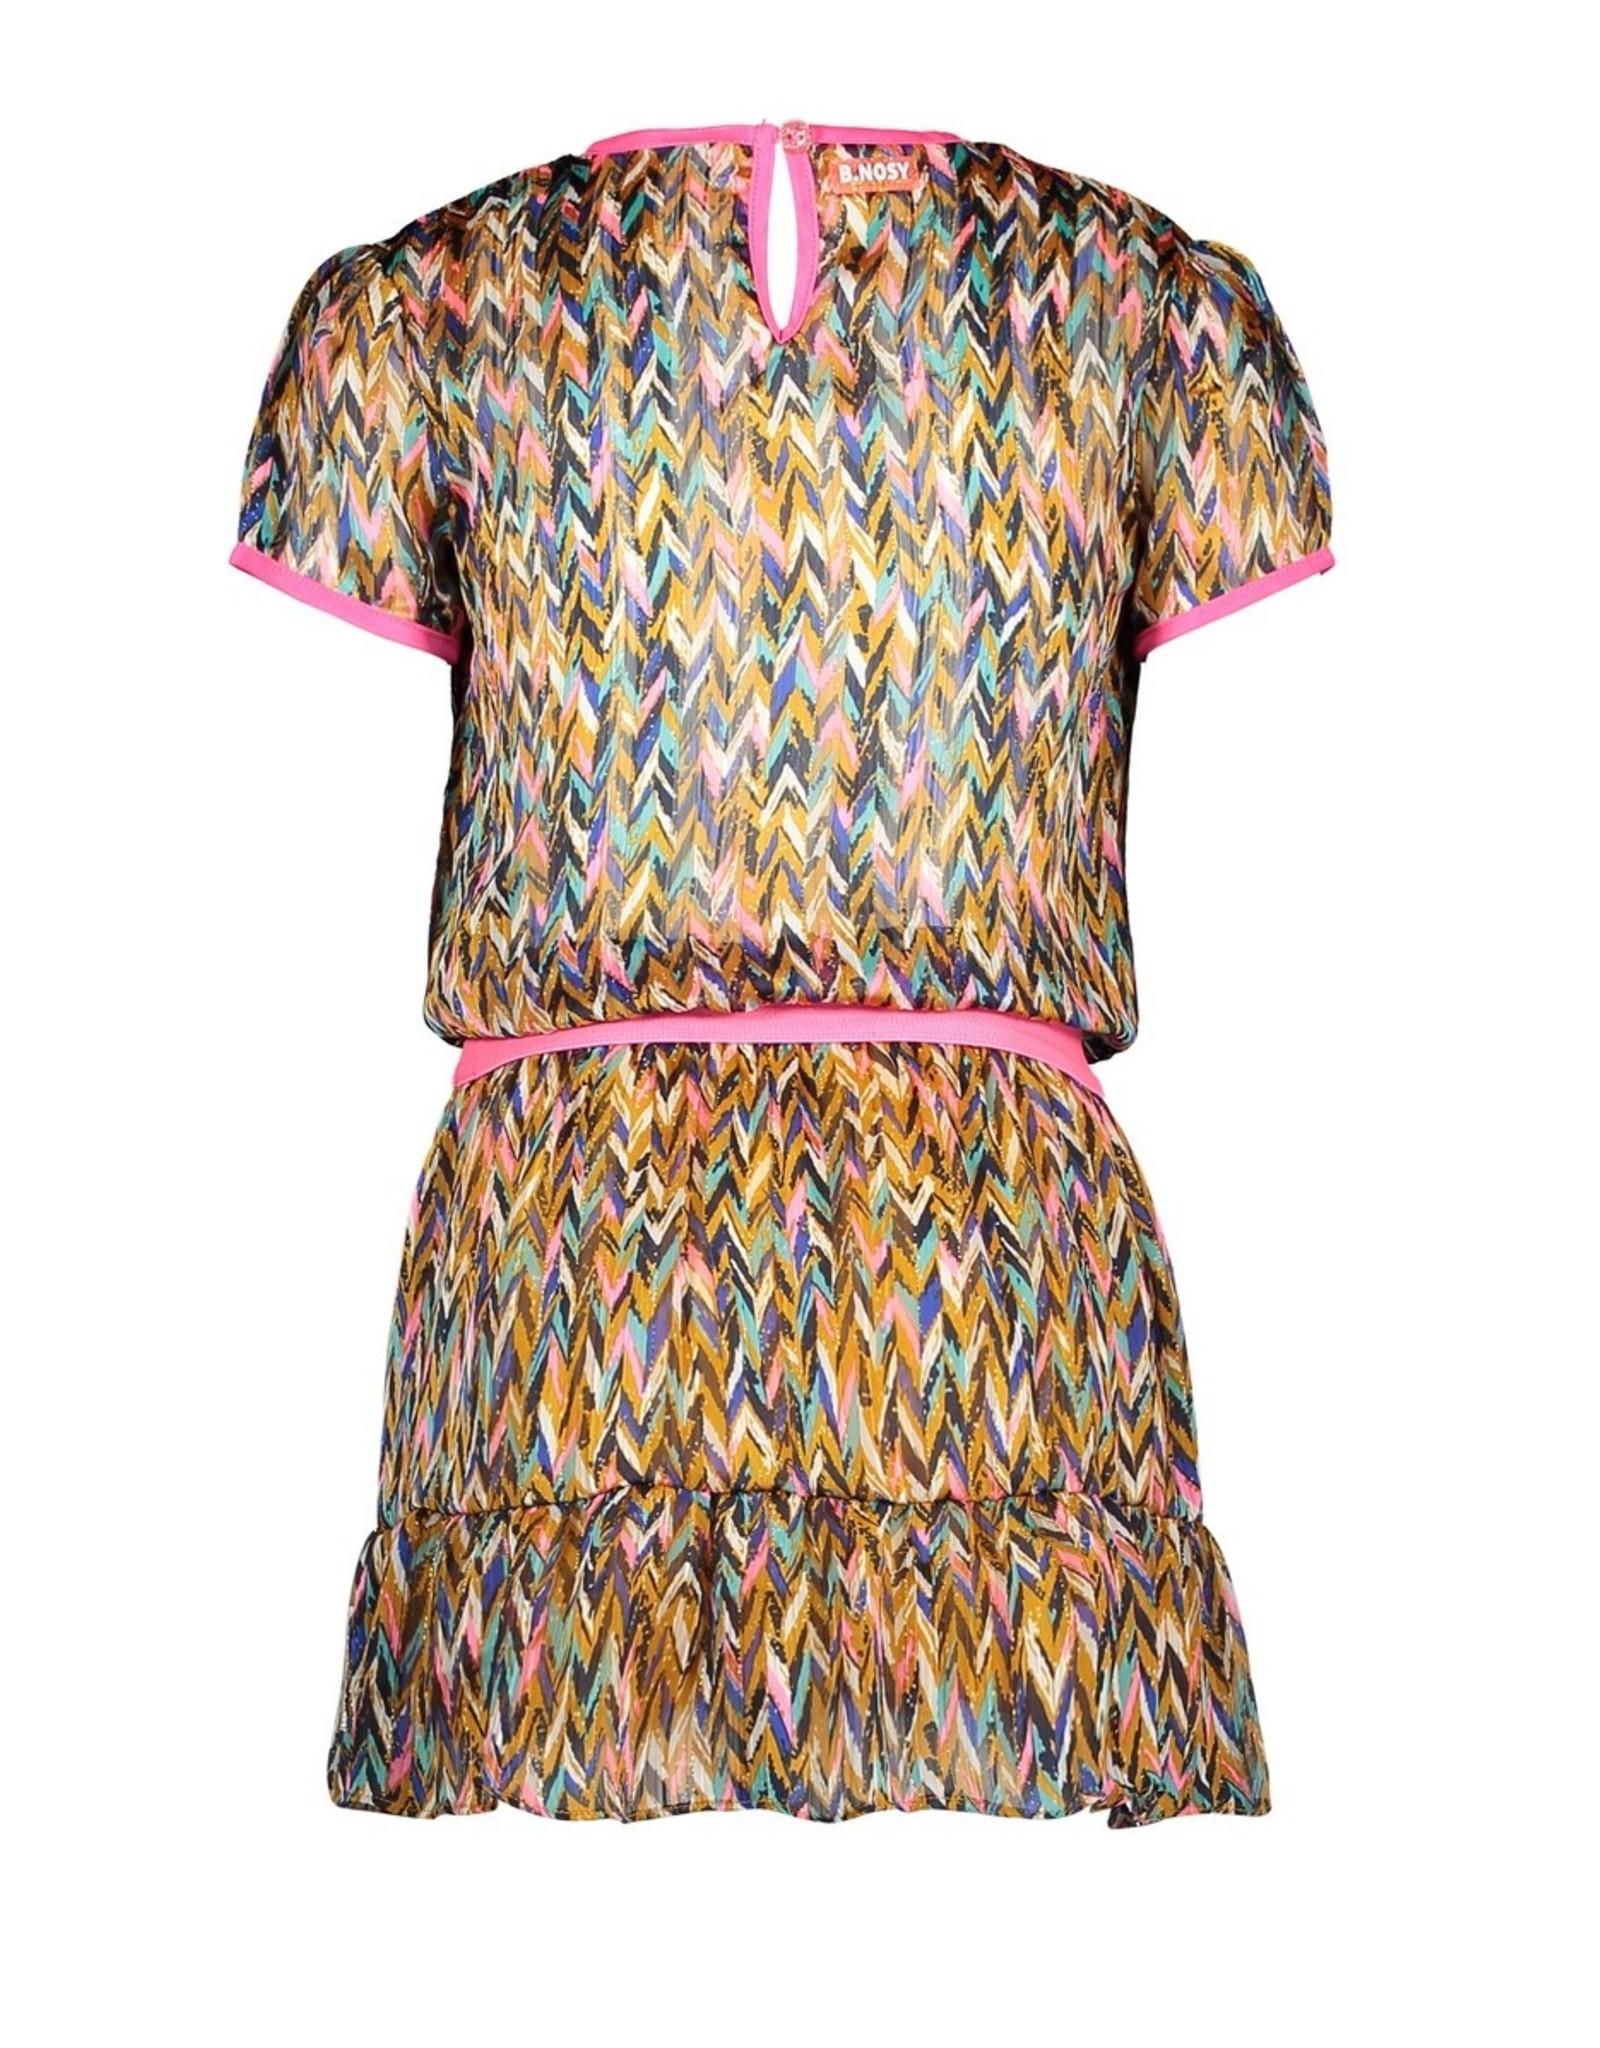 B-Nosy Girls curious aop woven dress with v-shaped ruffle, Curious ao